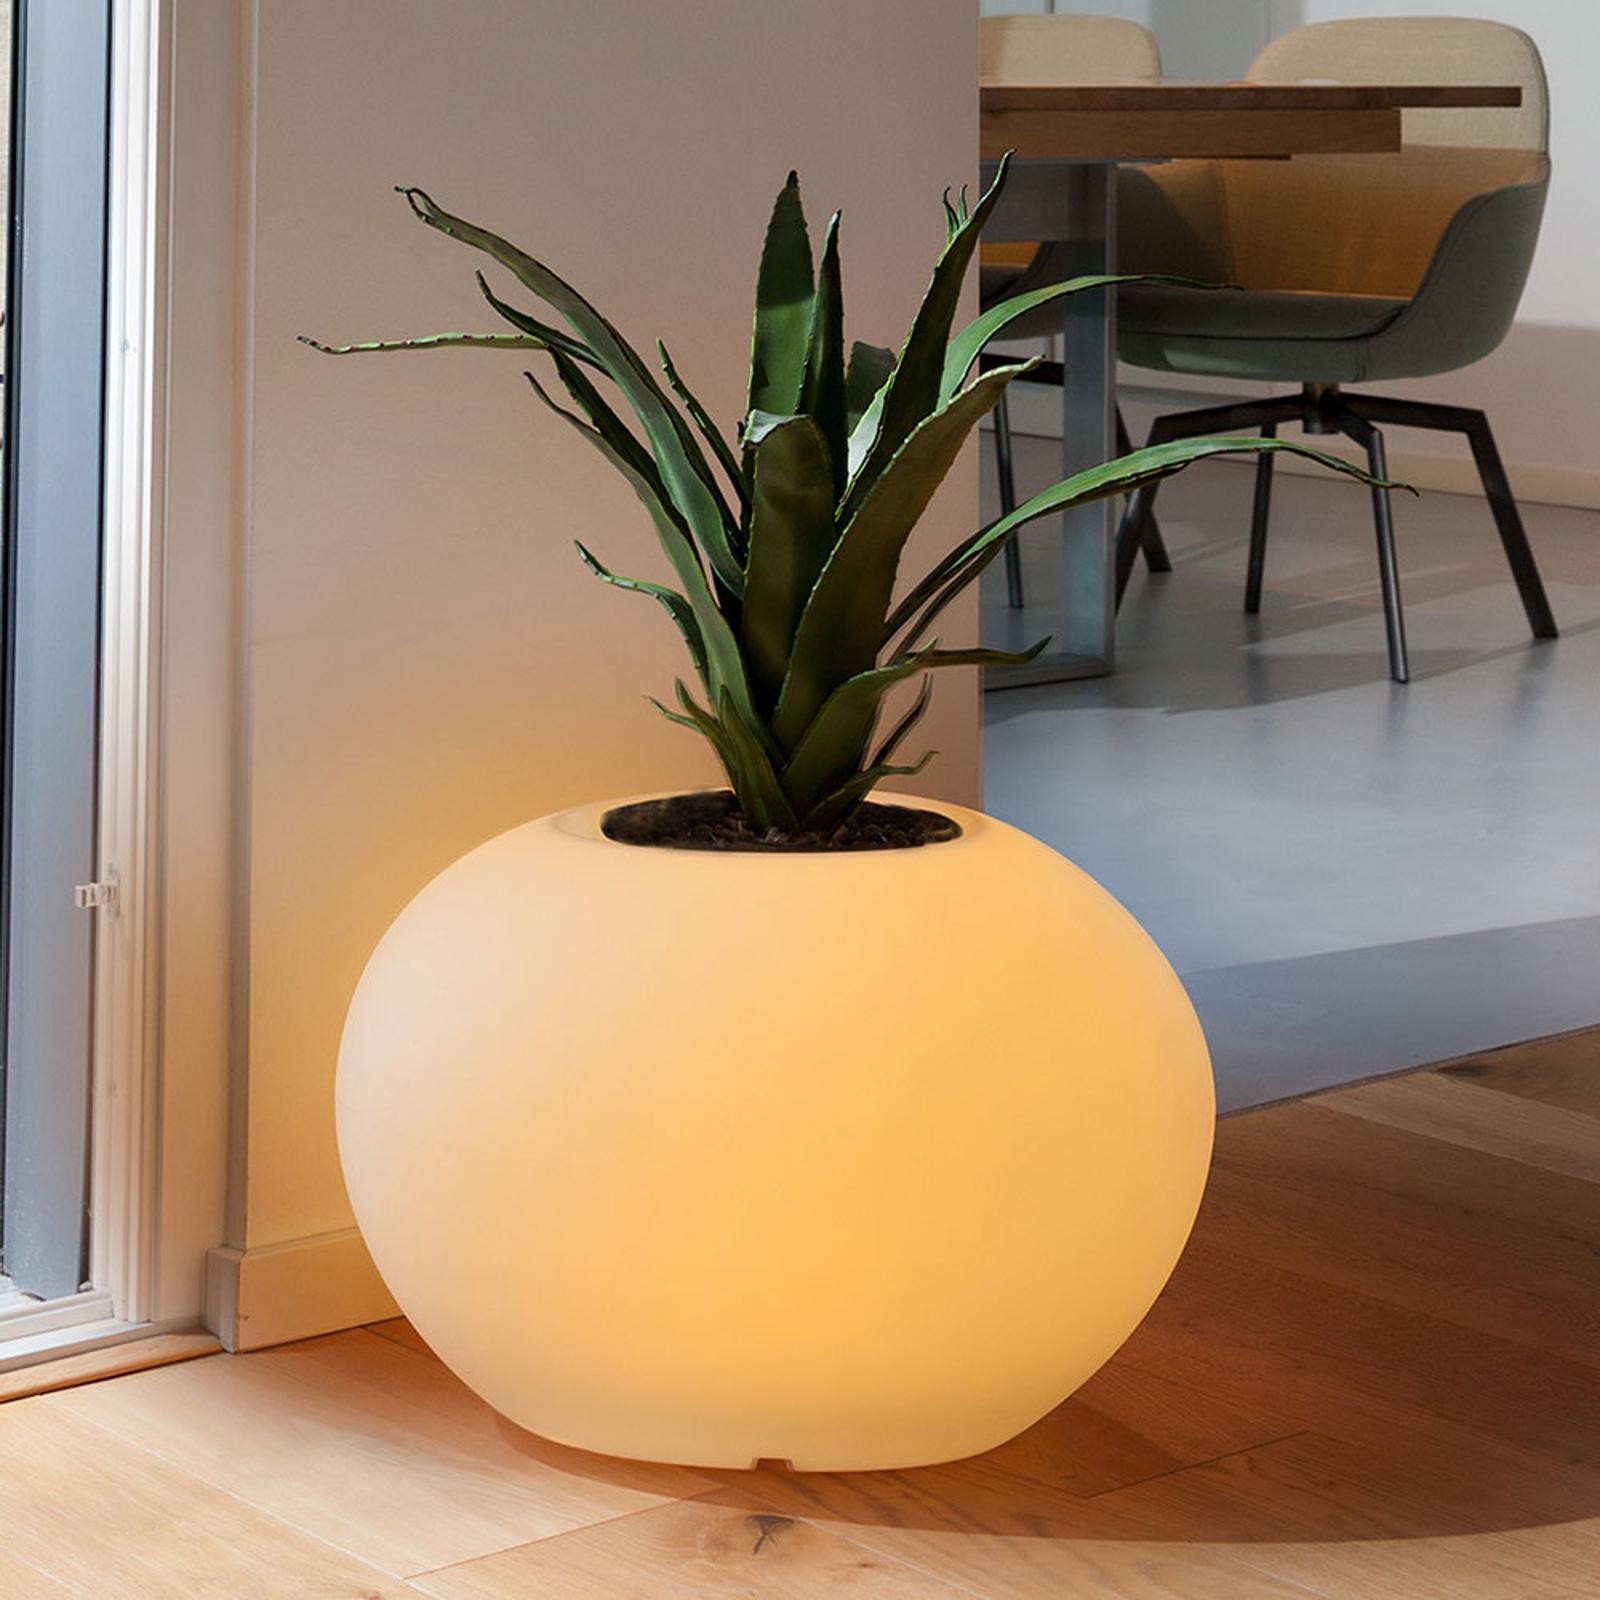 Storus VII LED RGBW dekolampe, kan beplantes, hvid